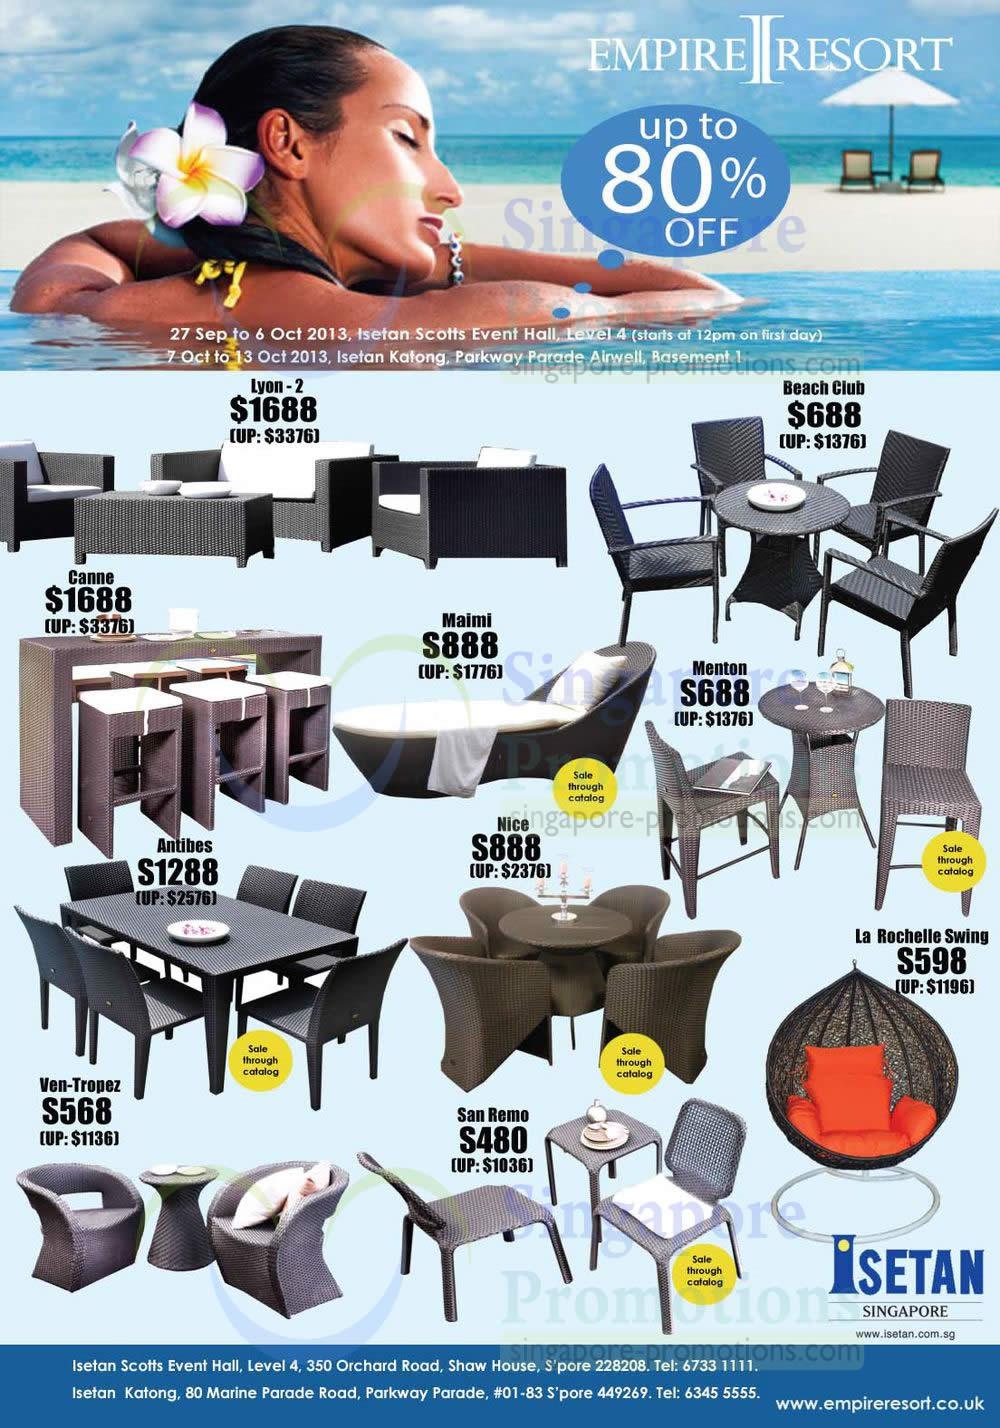 Furniture, Lyon, Canne, Maimi, Beach Club, Nice